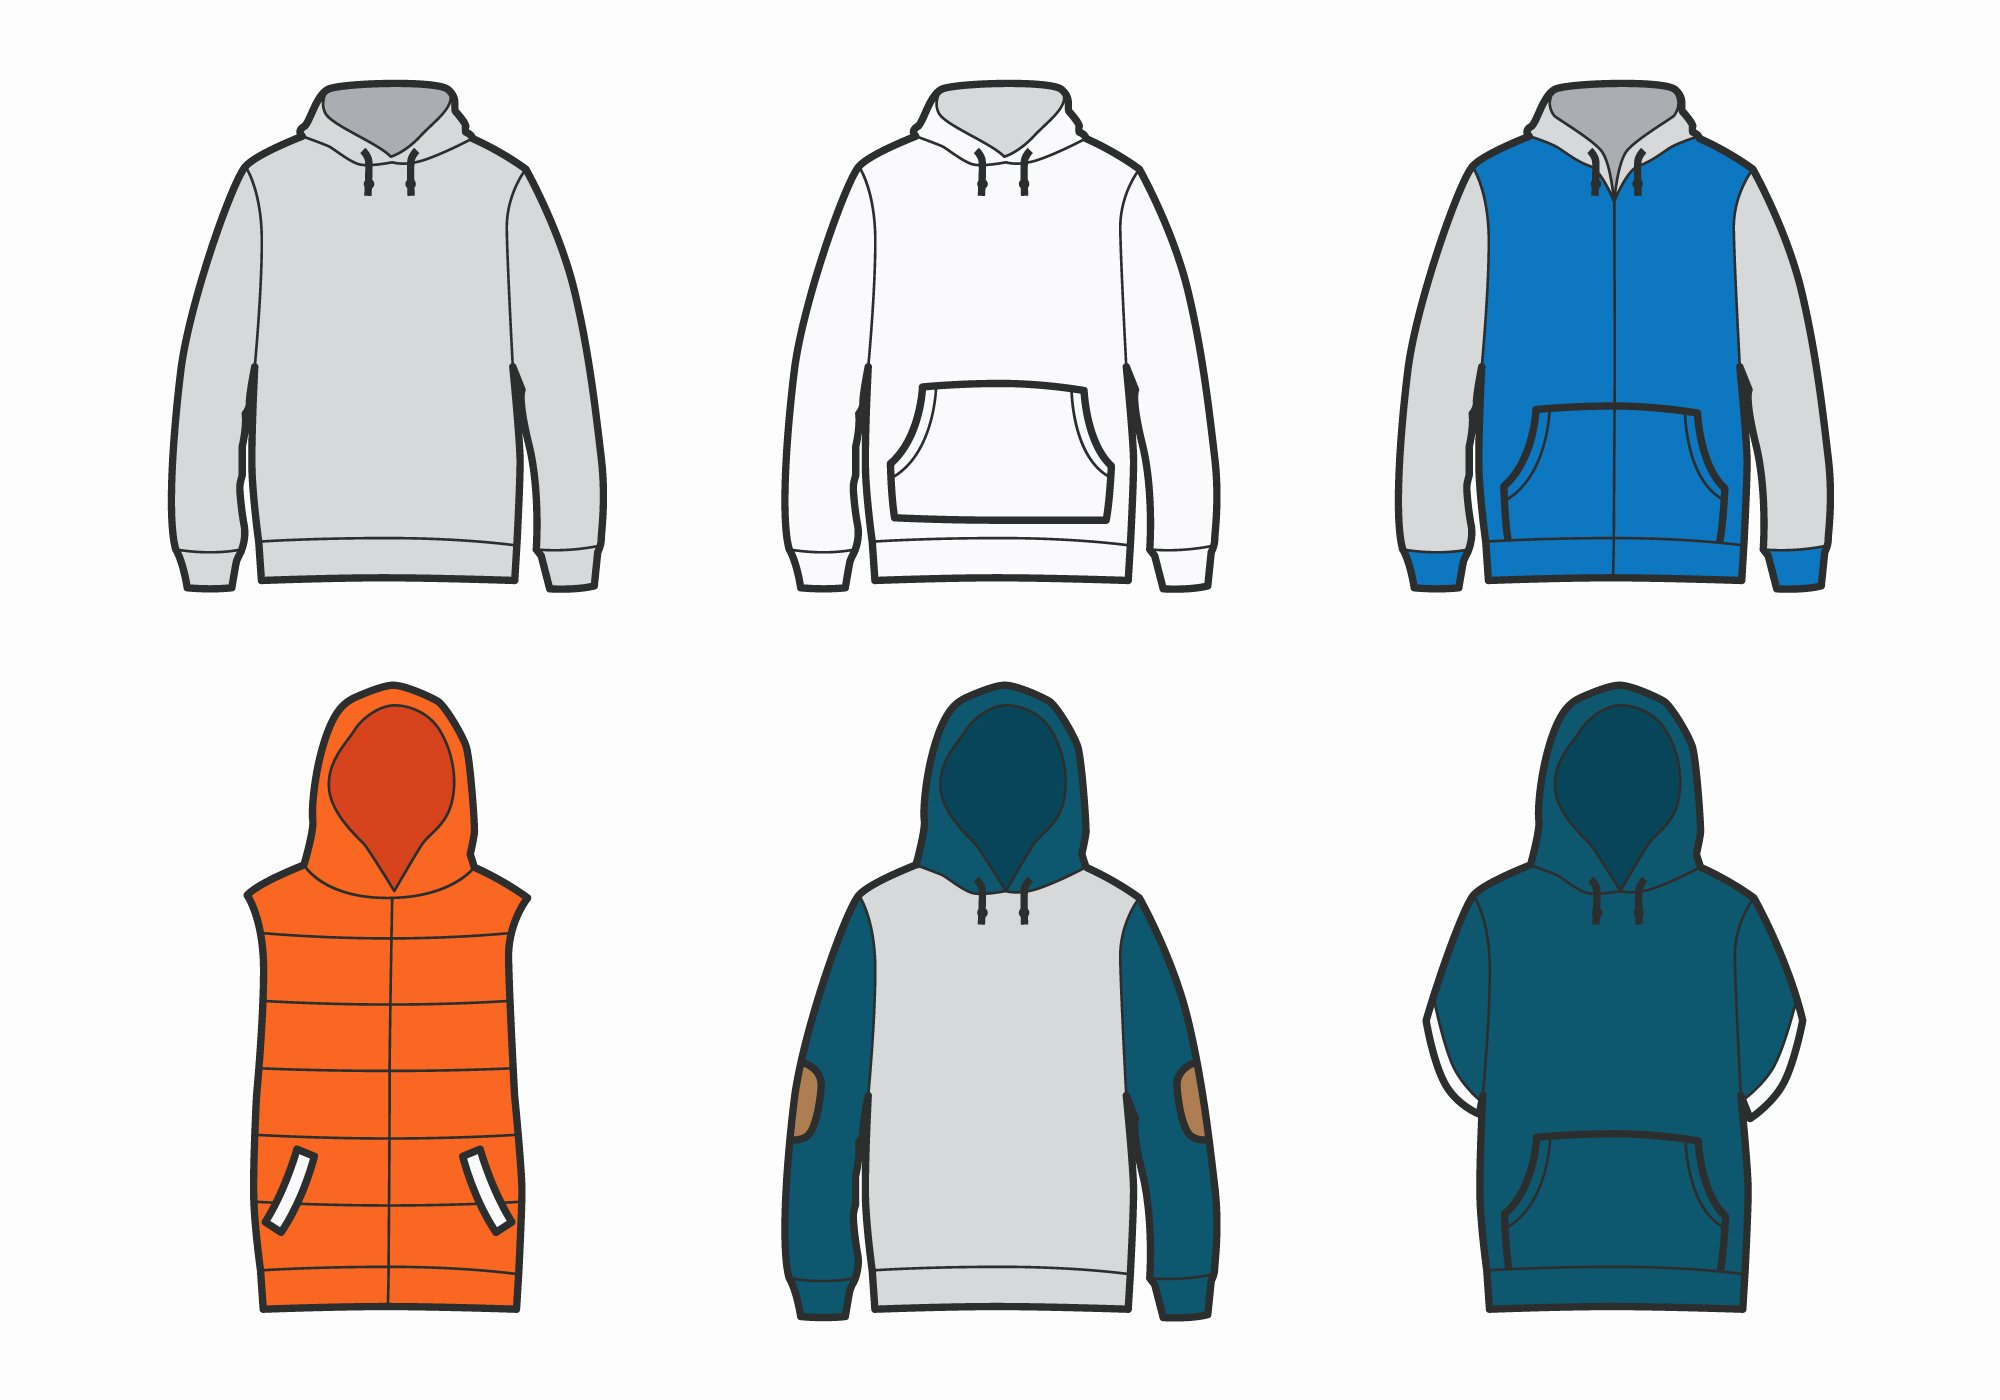 Hooded Sweatshirt Template Luxury Outlined Blank Hoo Template Download Free Vector Art